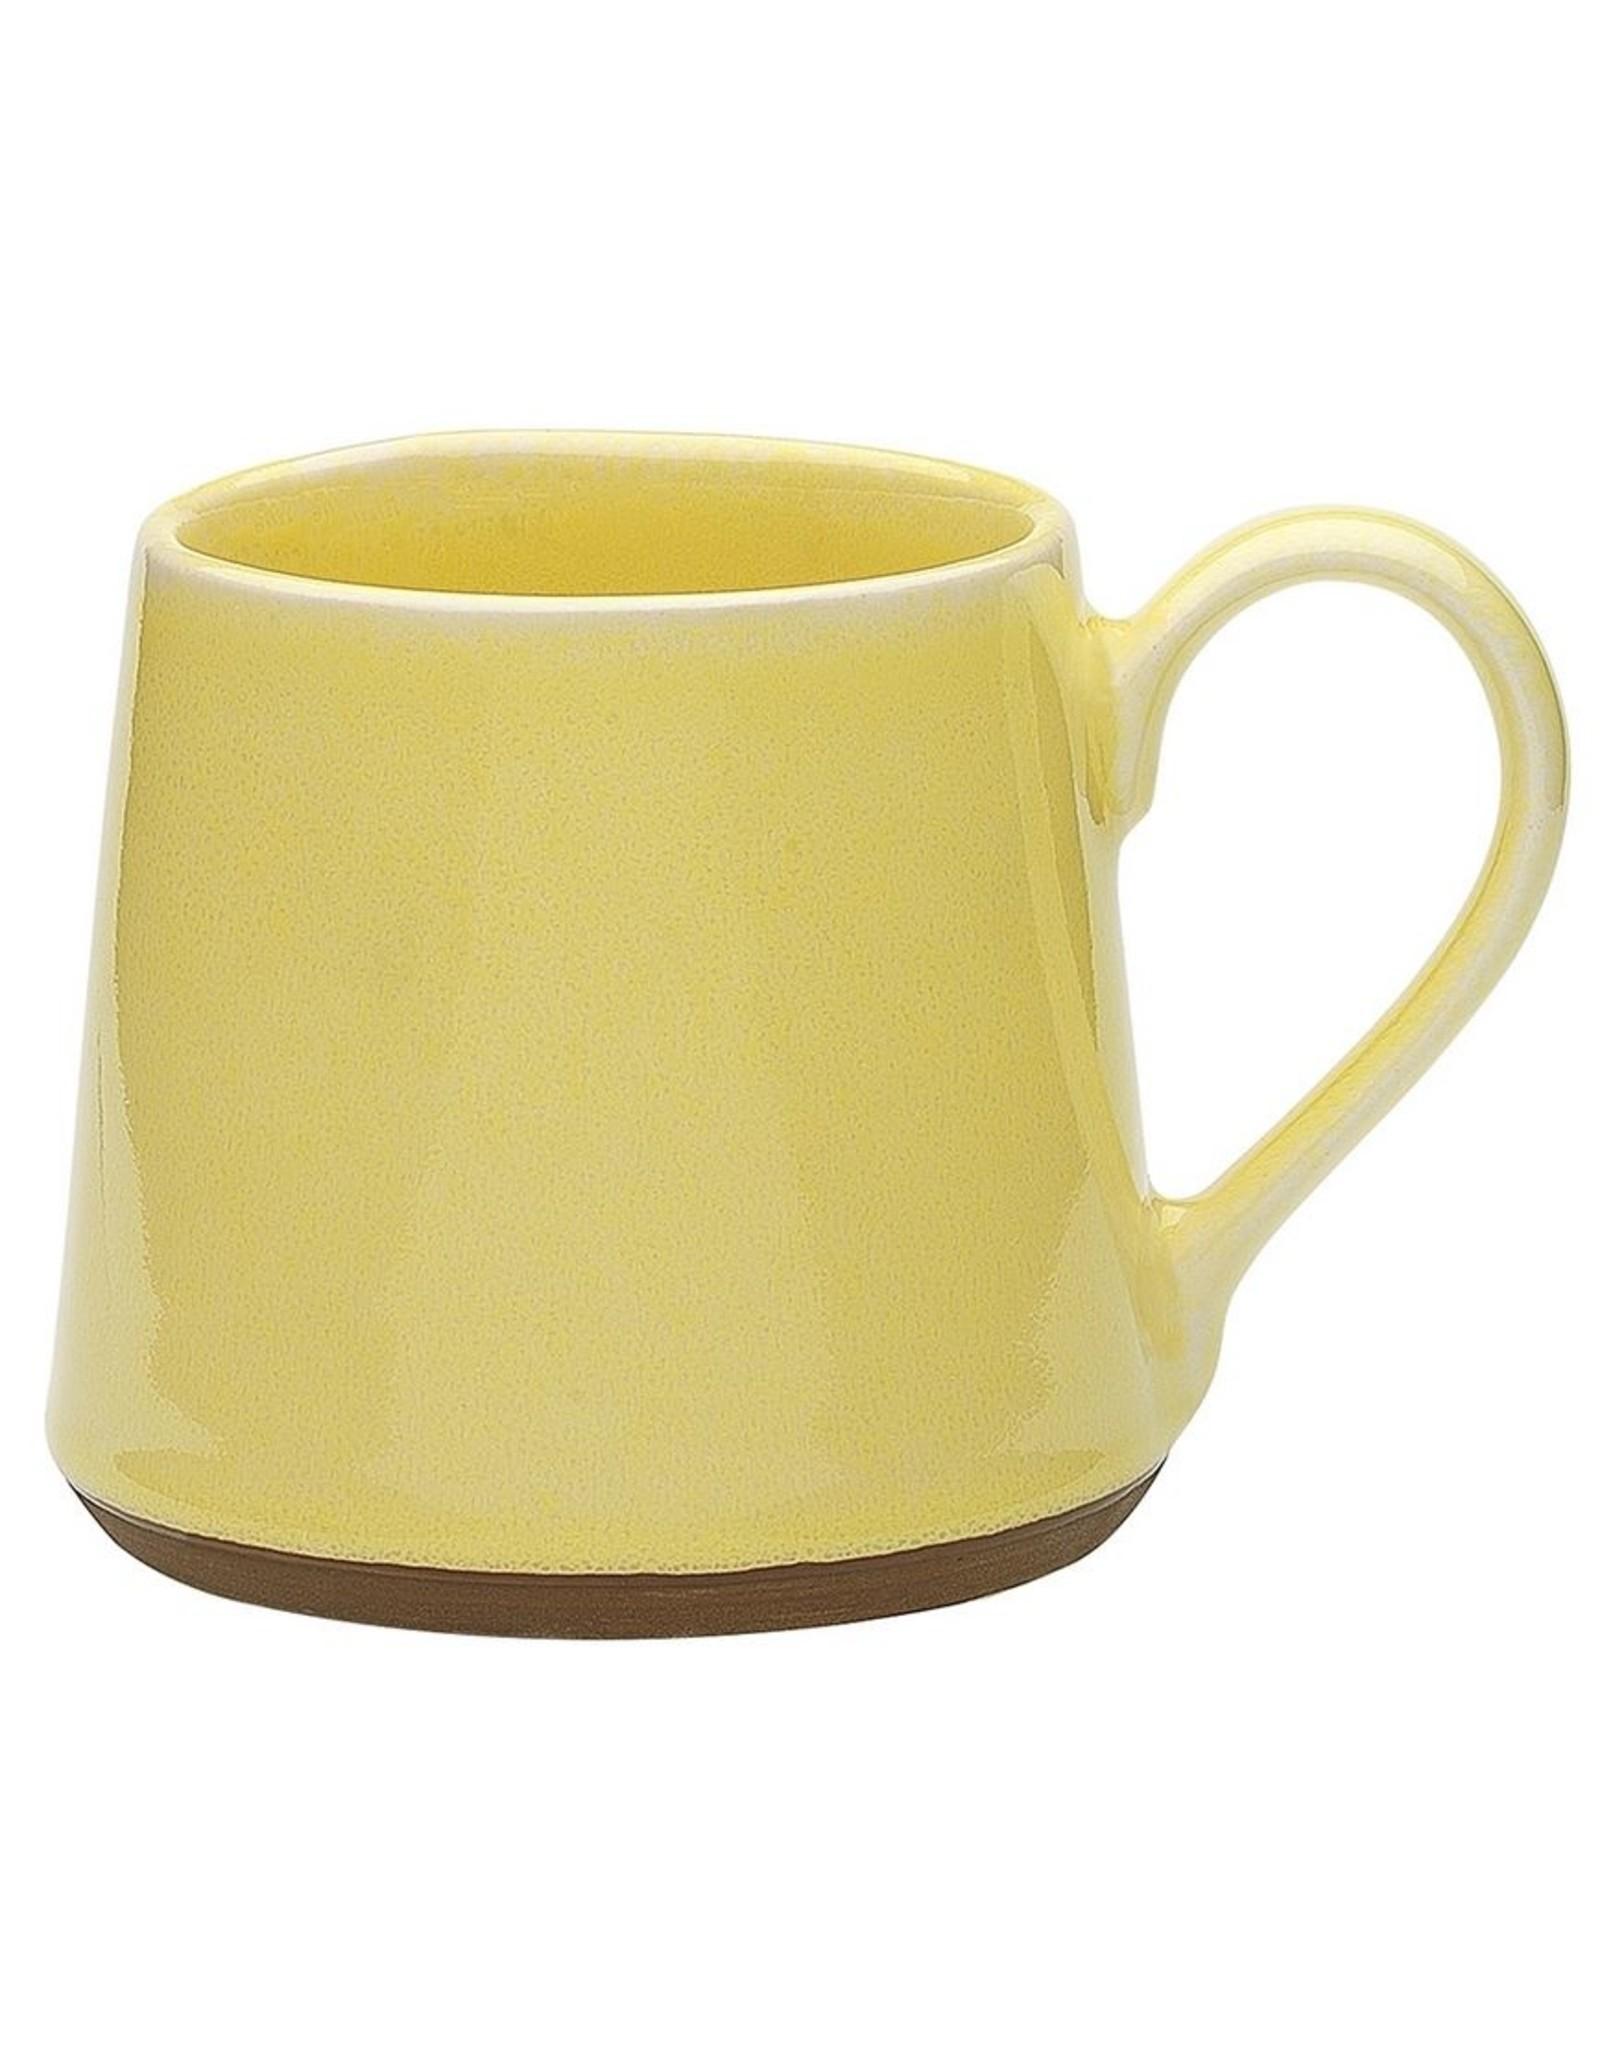 Juna Mug Myrtle 440ml